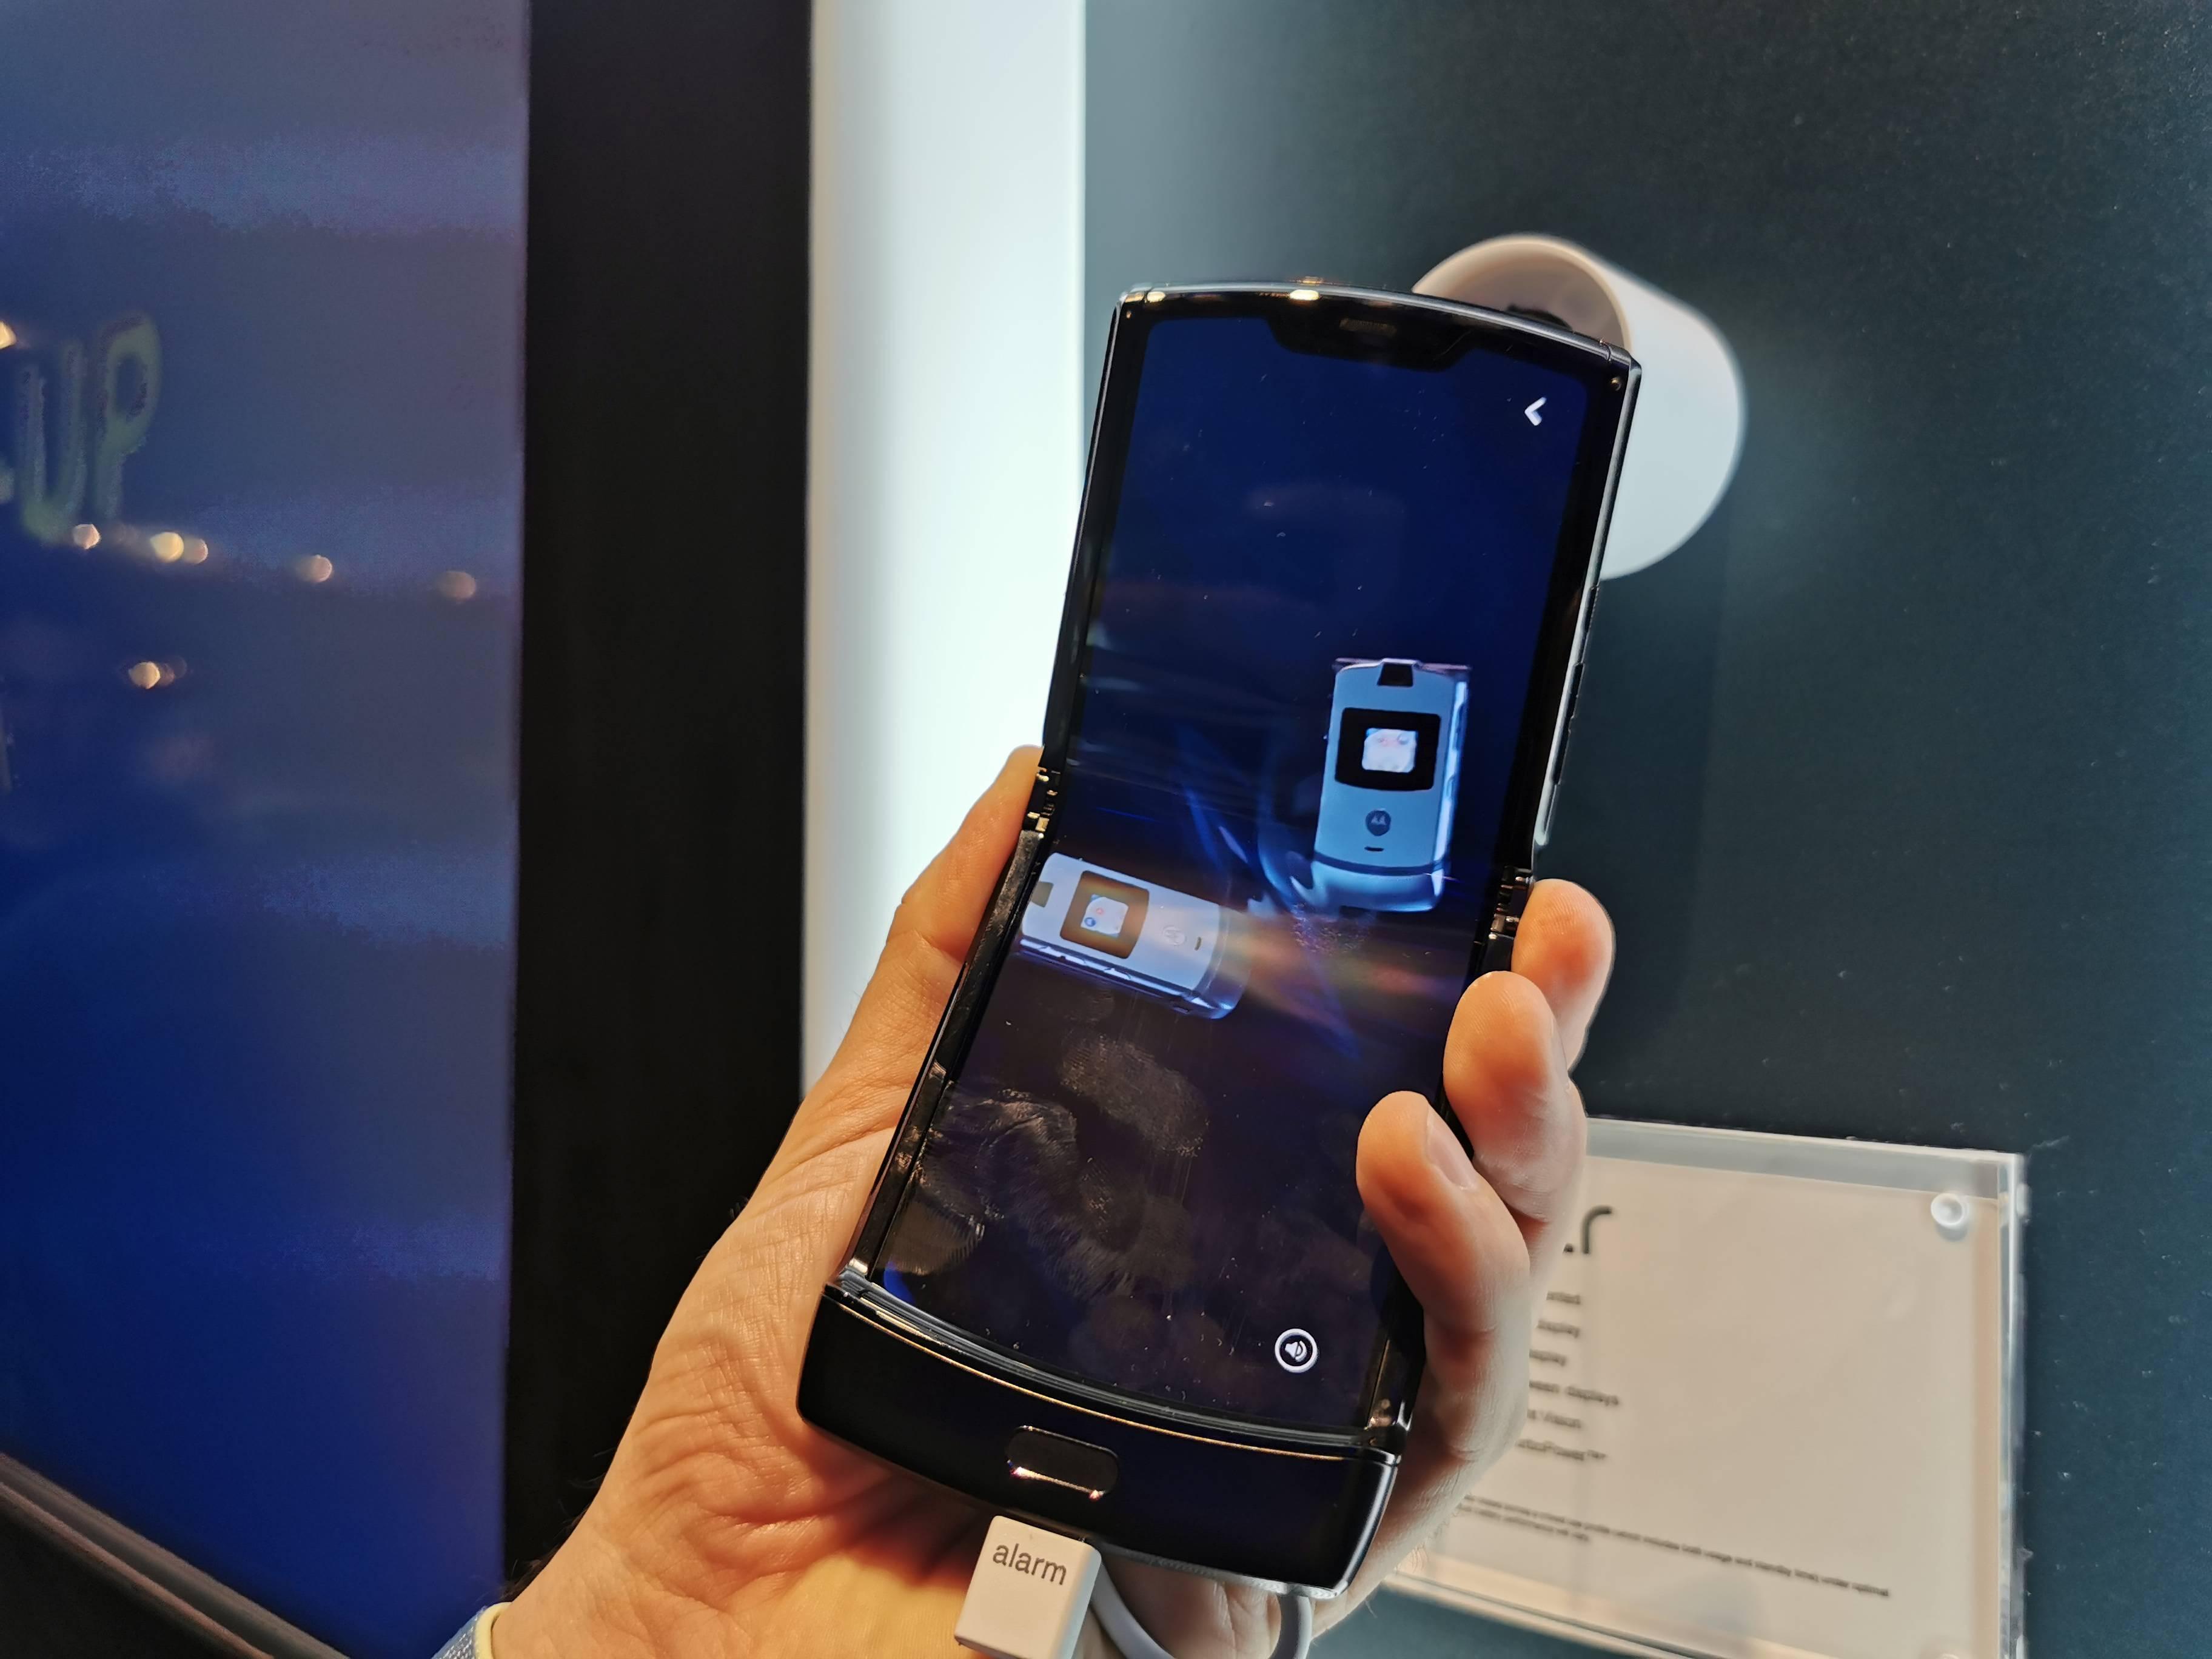 Moto Razr: Primeras impresiones del plegable presentado por Lenovo #CES2020